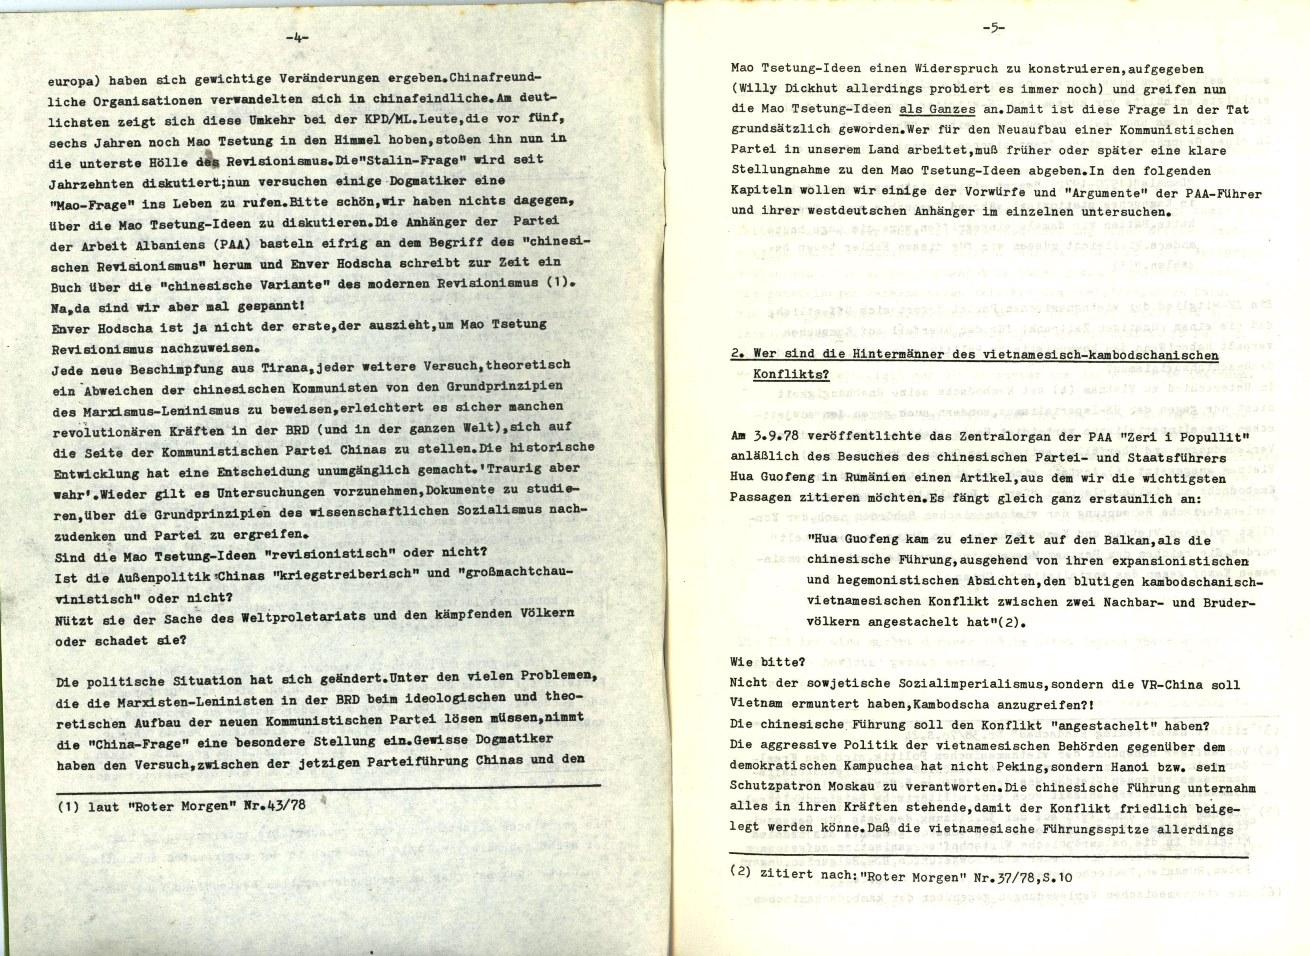 Muenchen_Kampf_dem_Revisionismus_1978_08_03